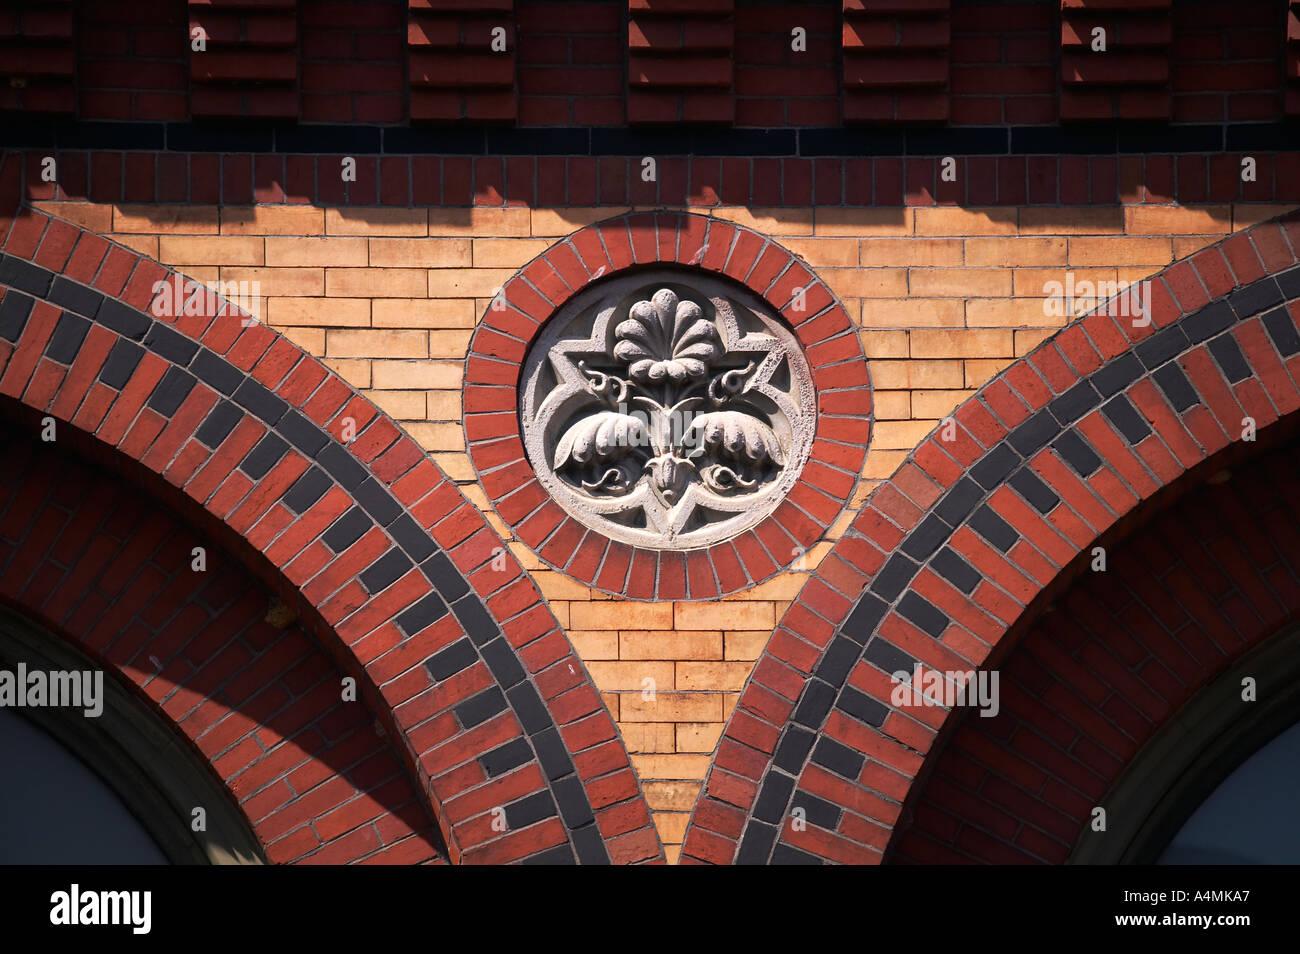 Brickwork detail on the circa 1879 Smithsonian Arts and Industries Building Washington DC USA - Stock Image